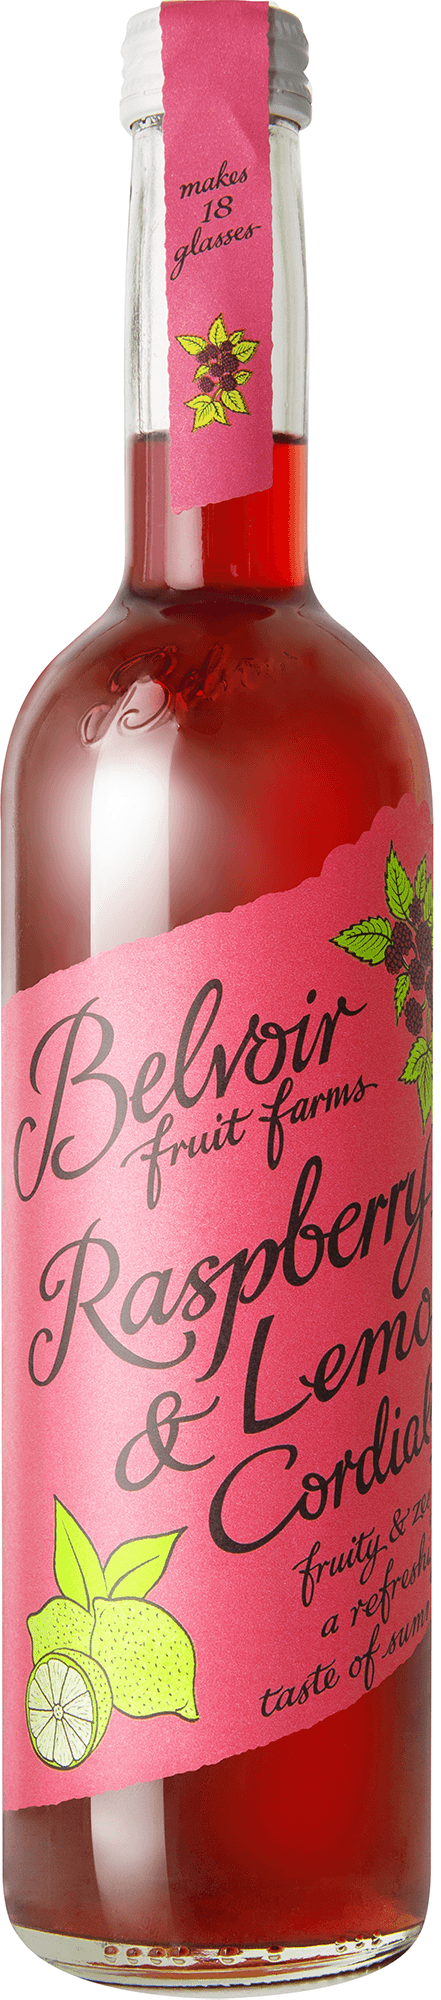 Belvoir Raspberry & Lemon